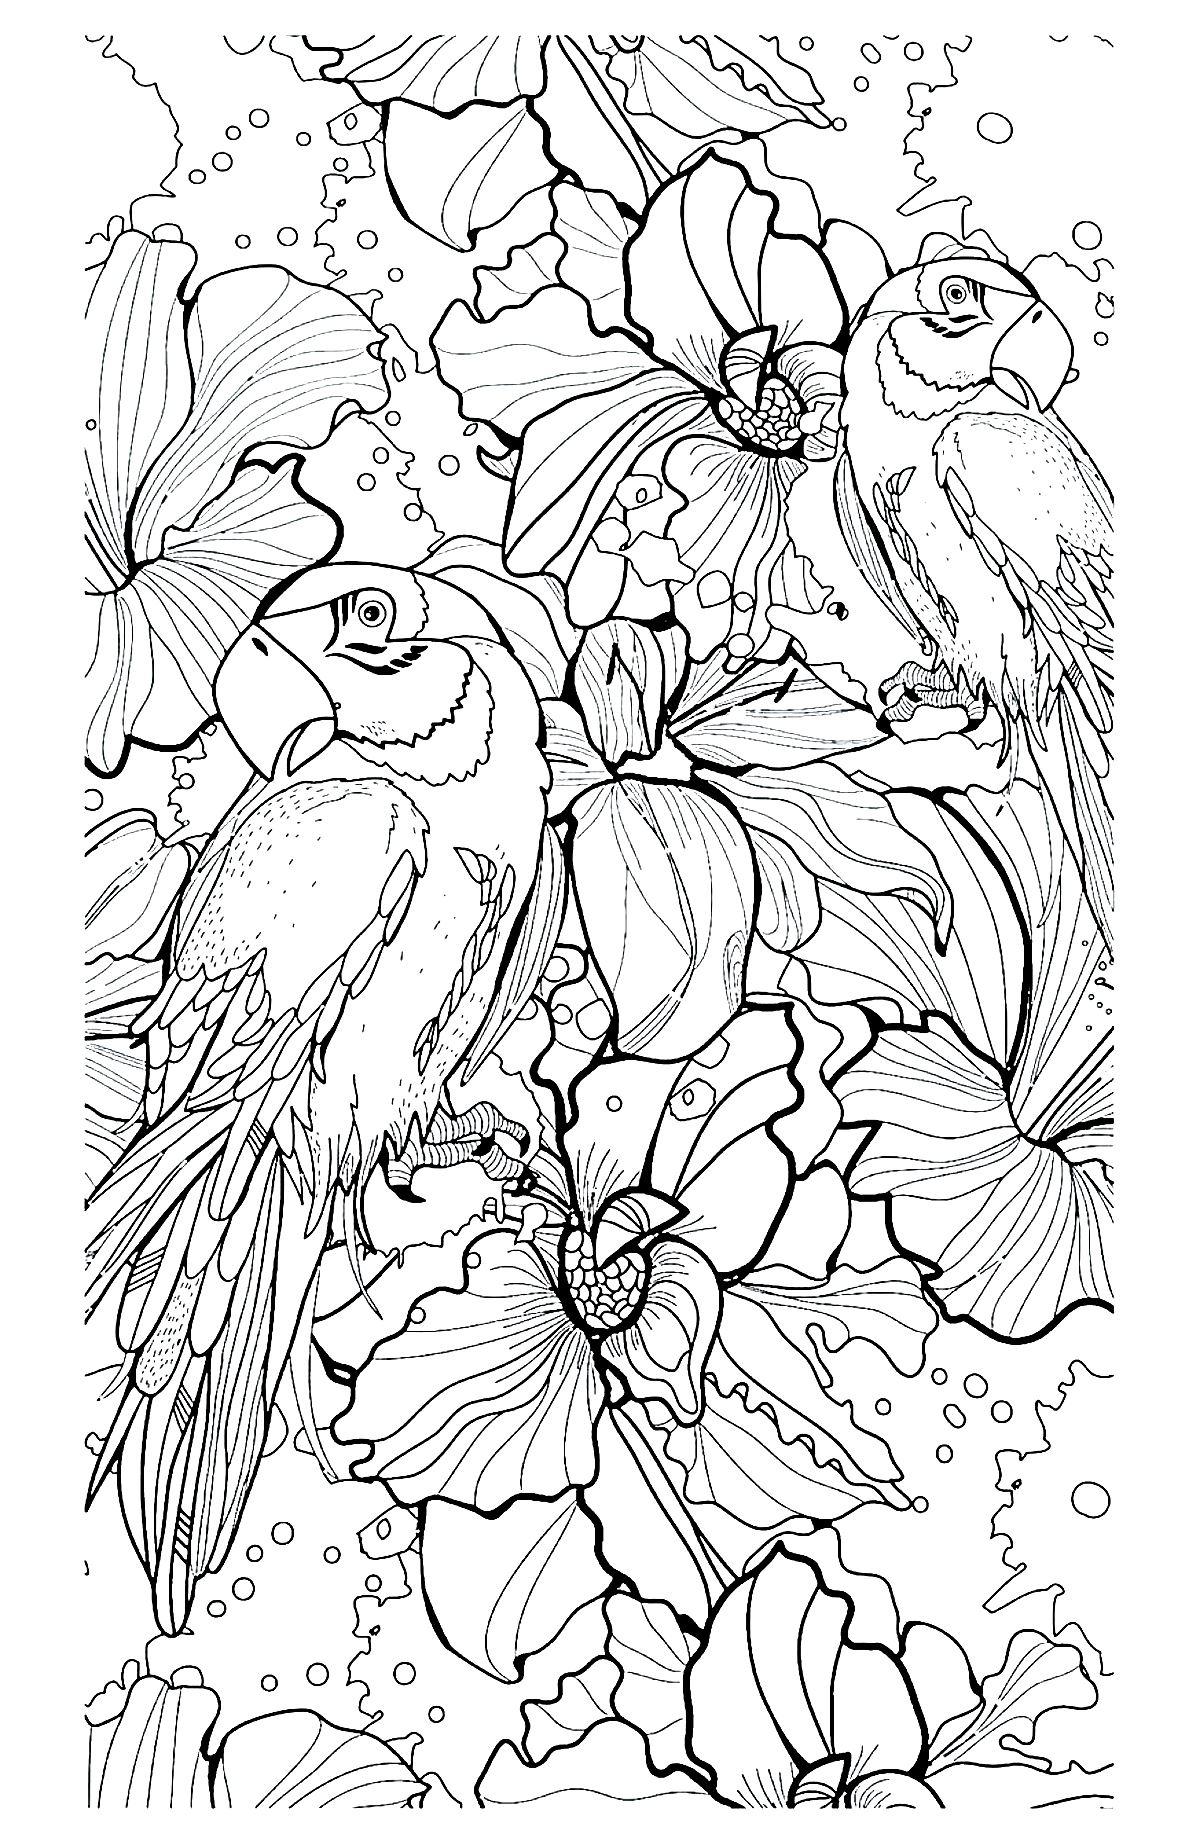 Jolis perroquets  mettre en couleur